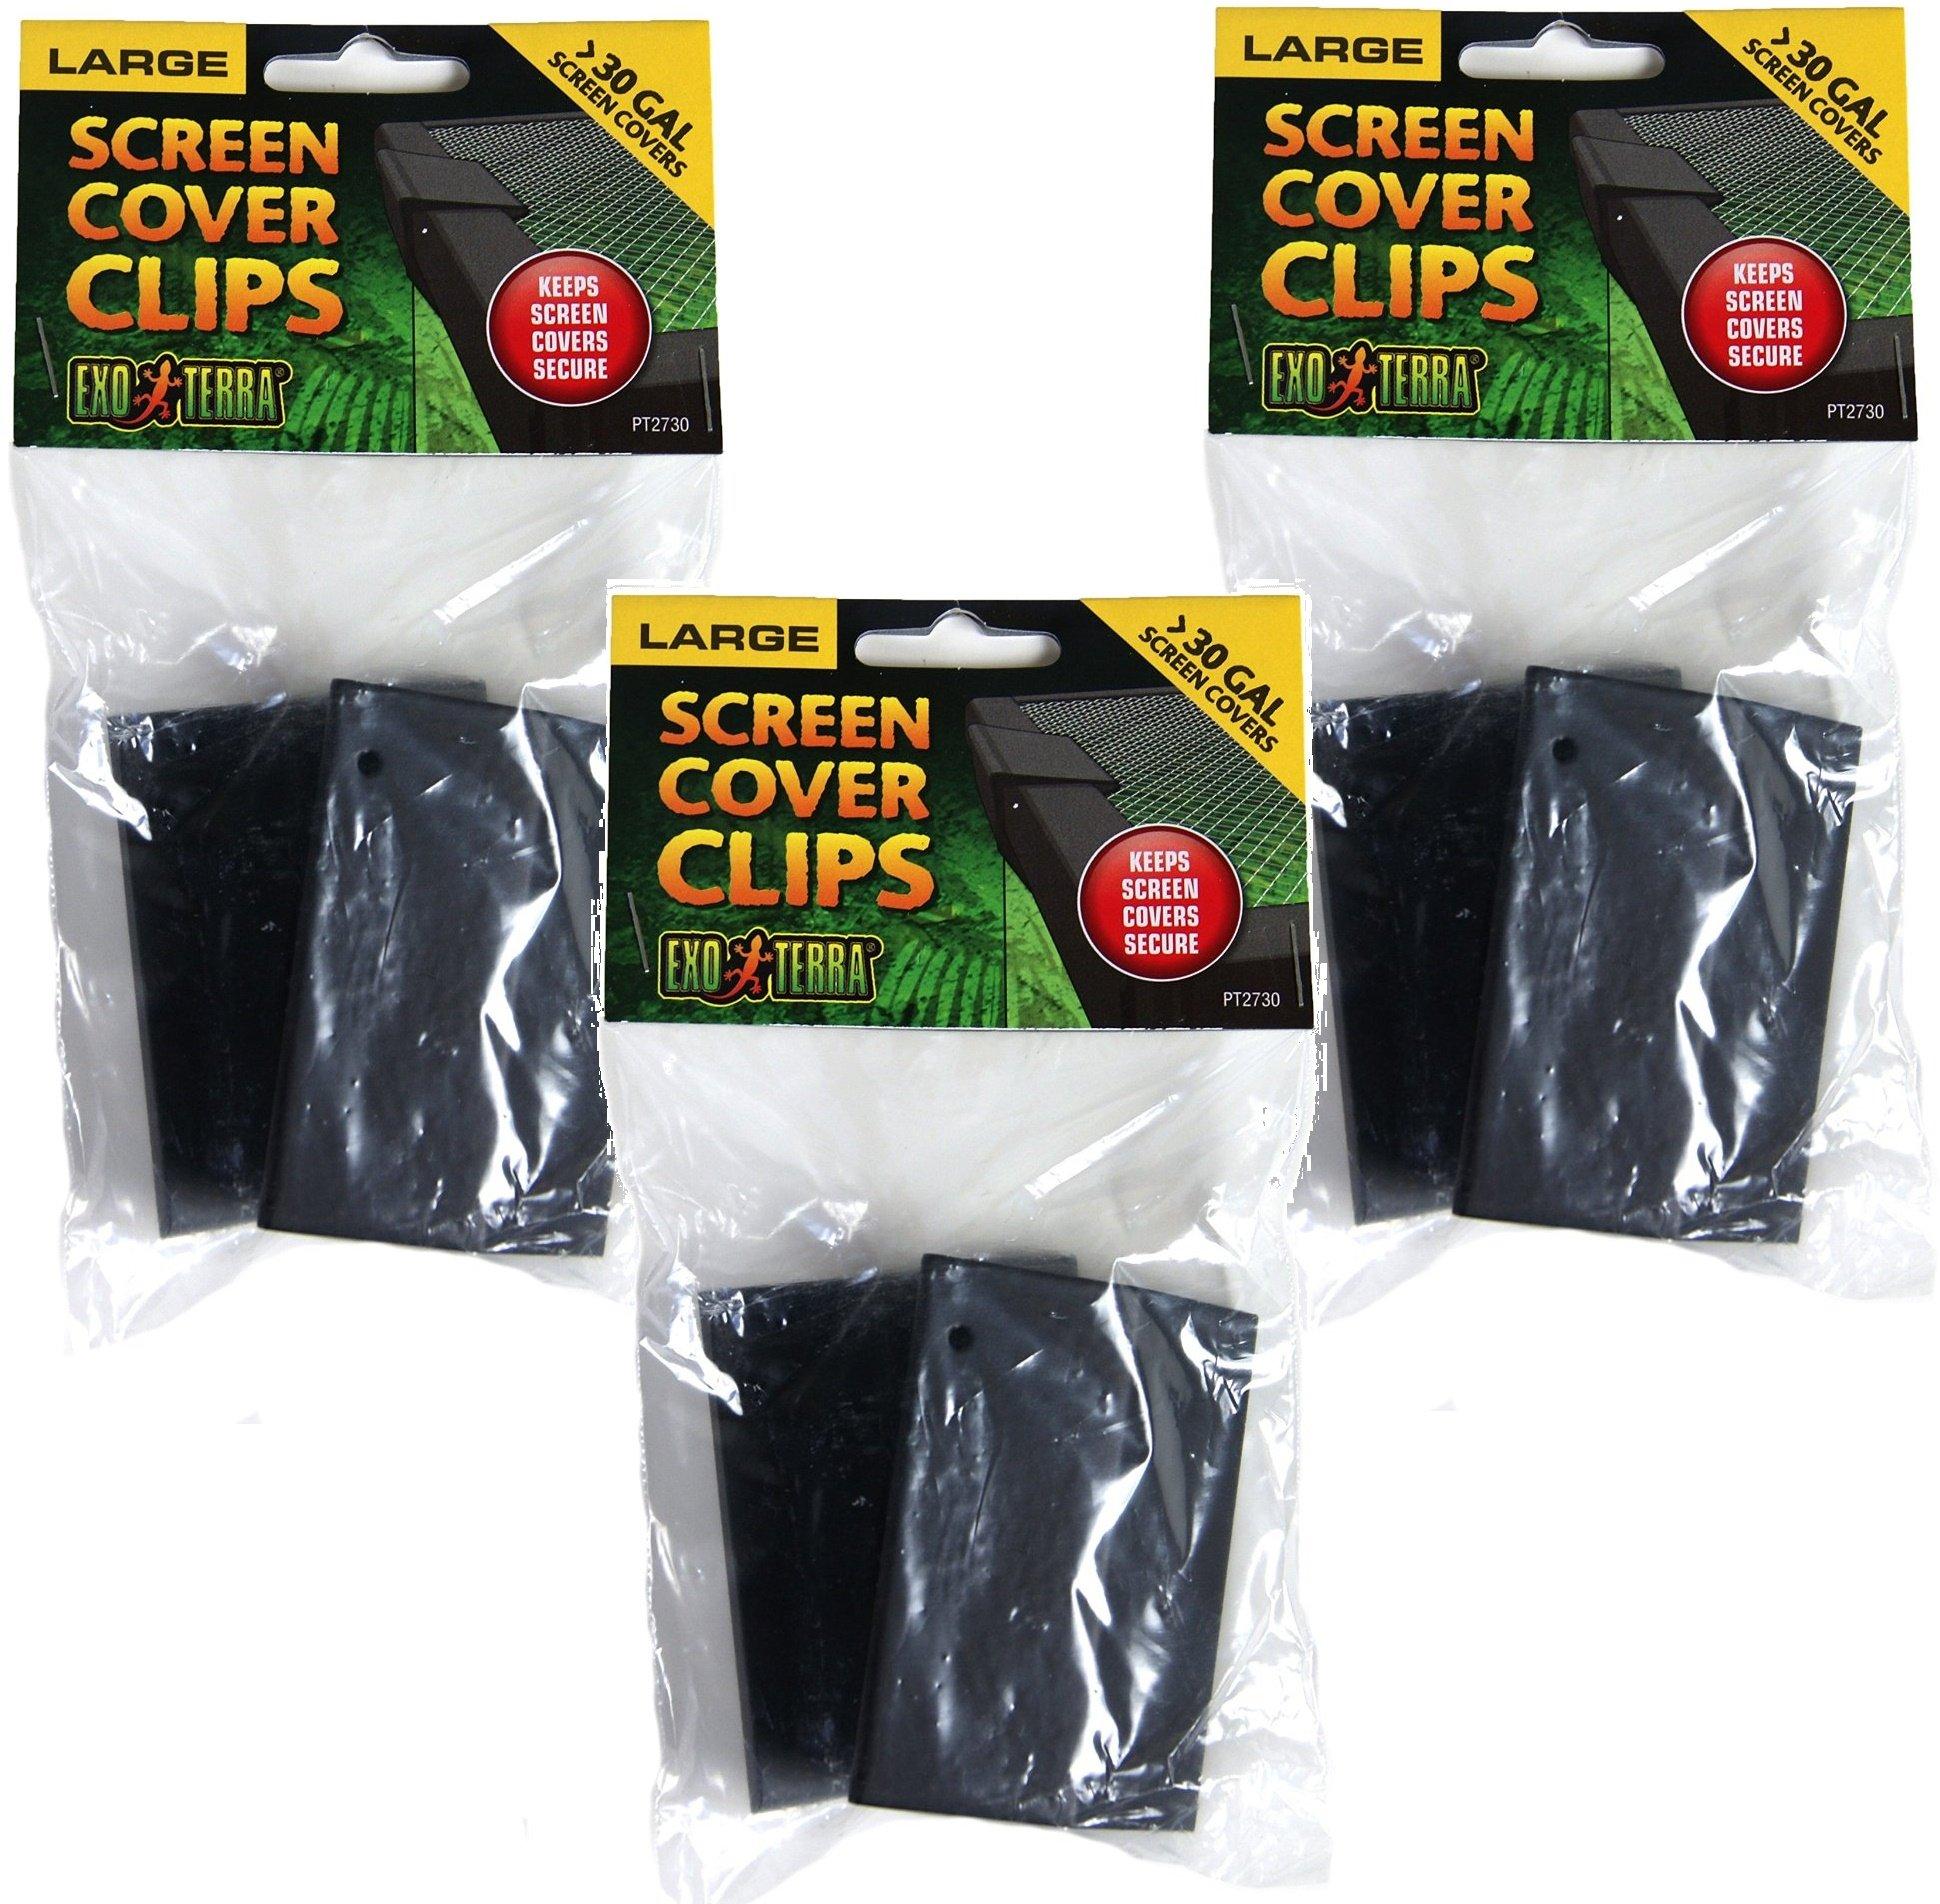 (3 Pack) Exo Terra Terrarium Cover Clip Set, Large, 2 Clips each